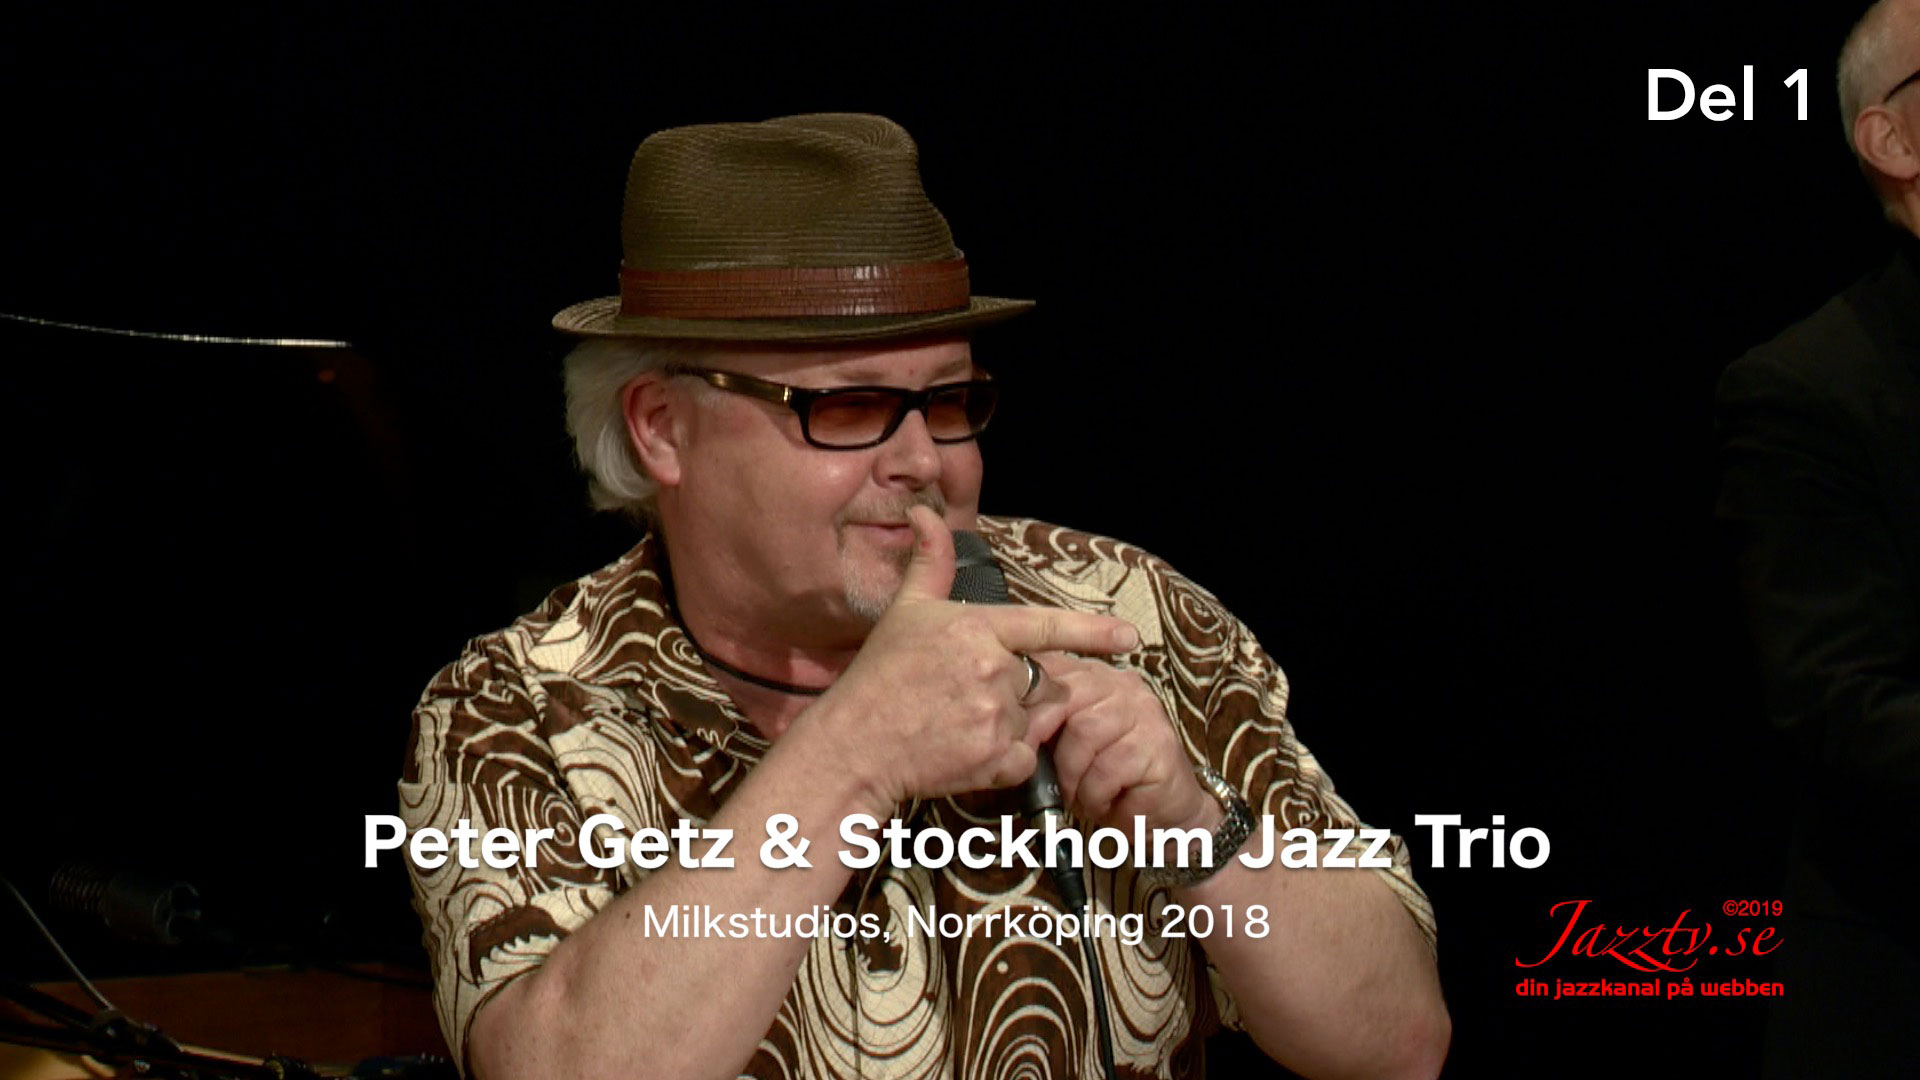 Peter Getz & Stockholm Jazz Trio